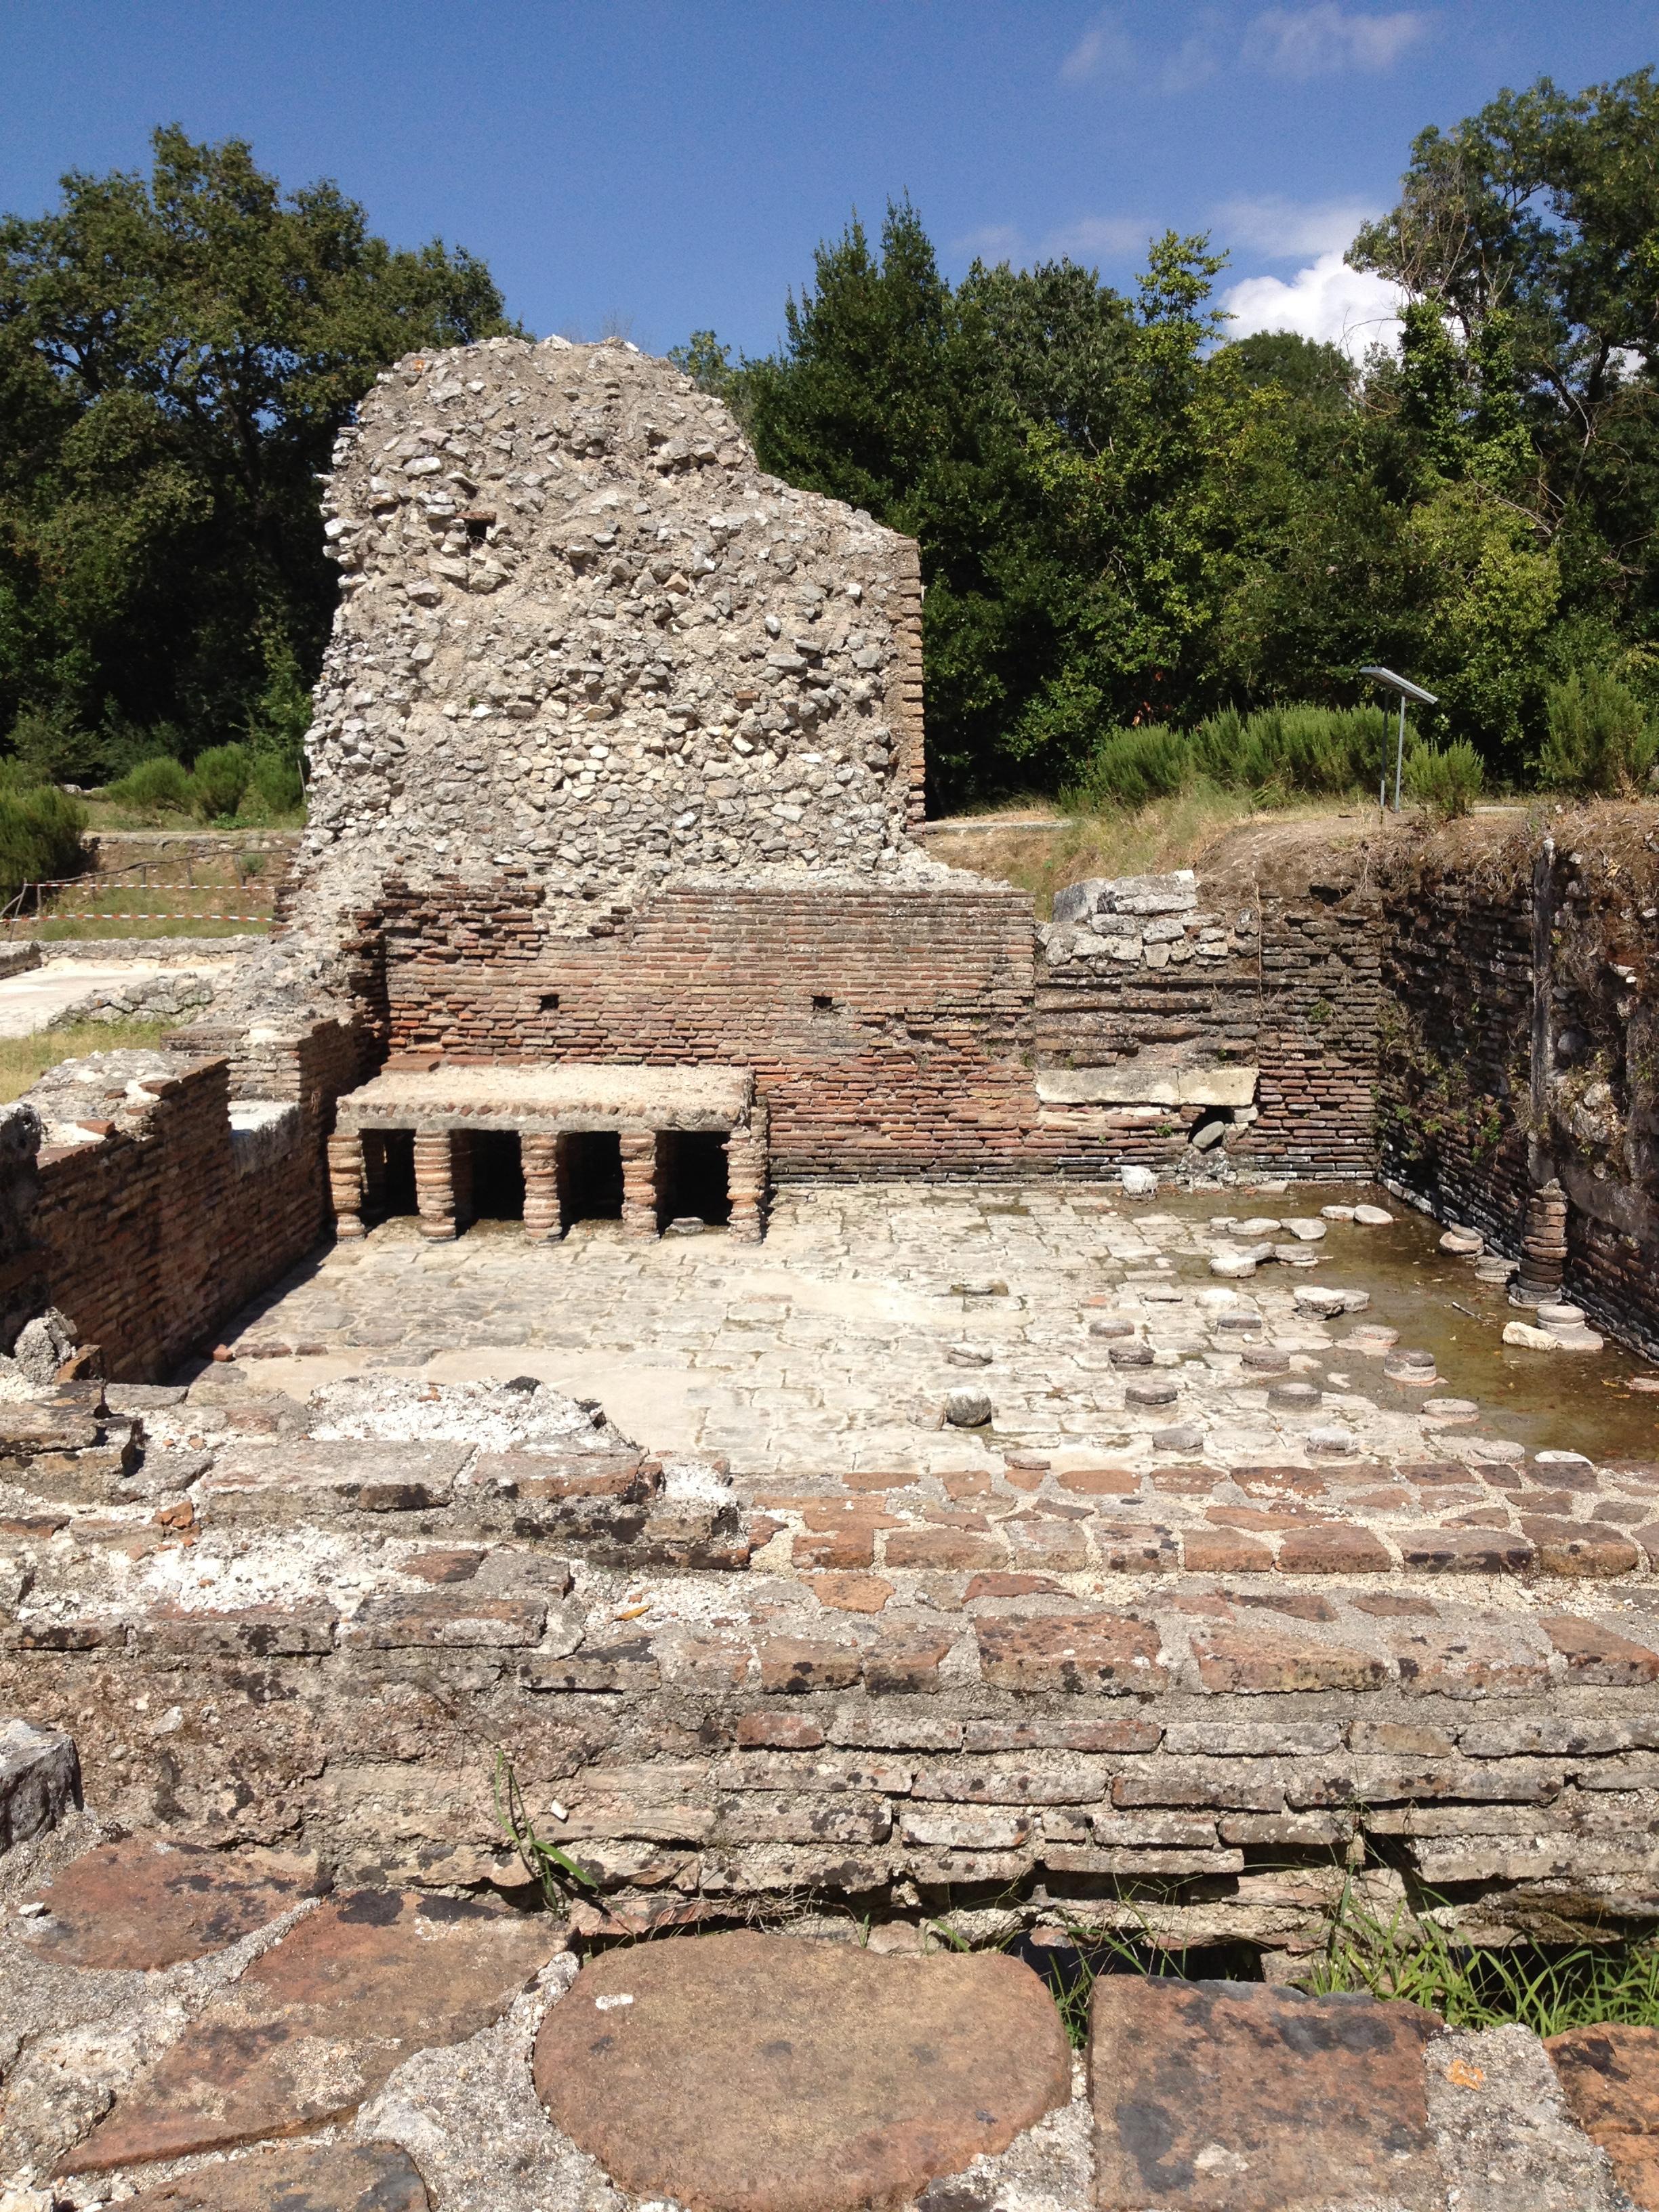 Remains of the Roman bathhouse, Butrint, Albania